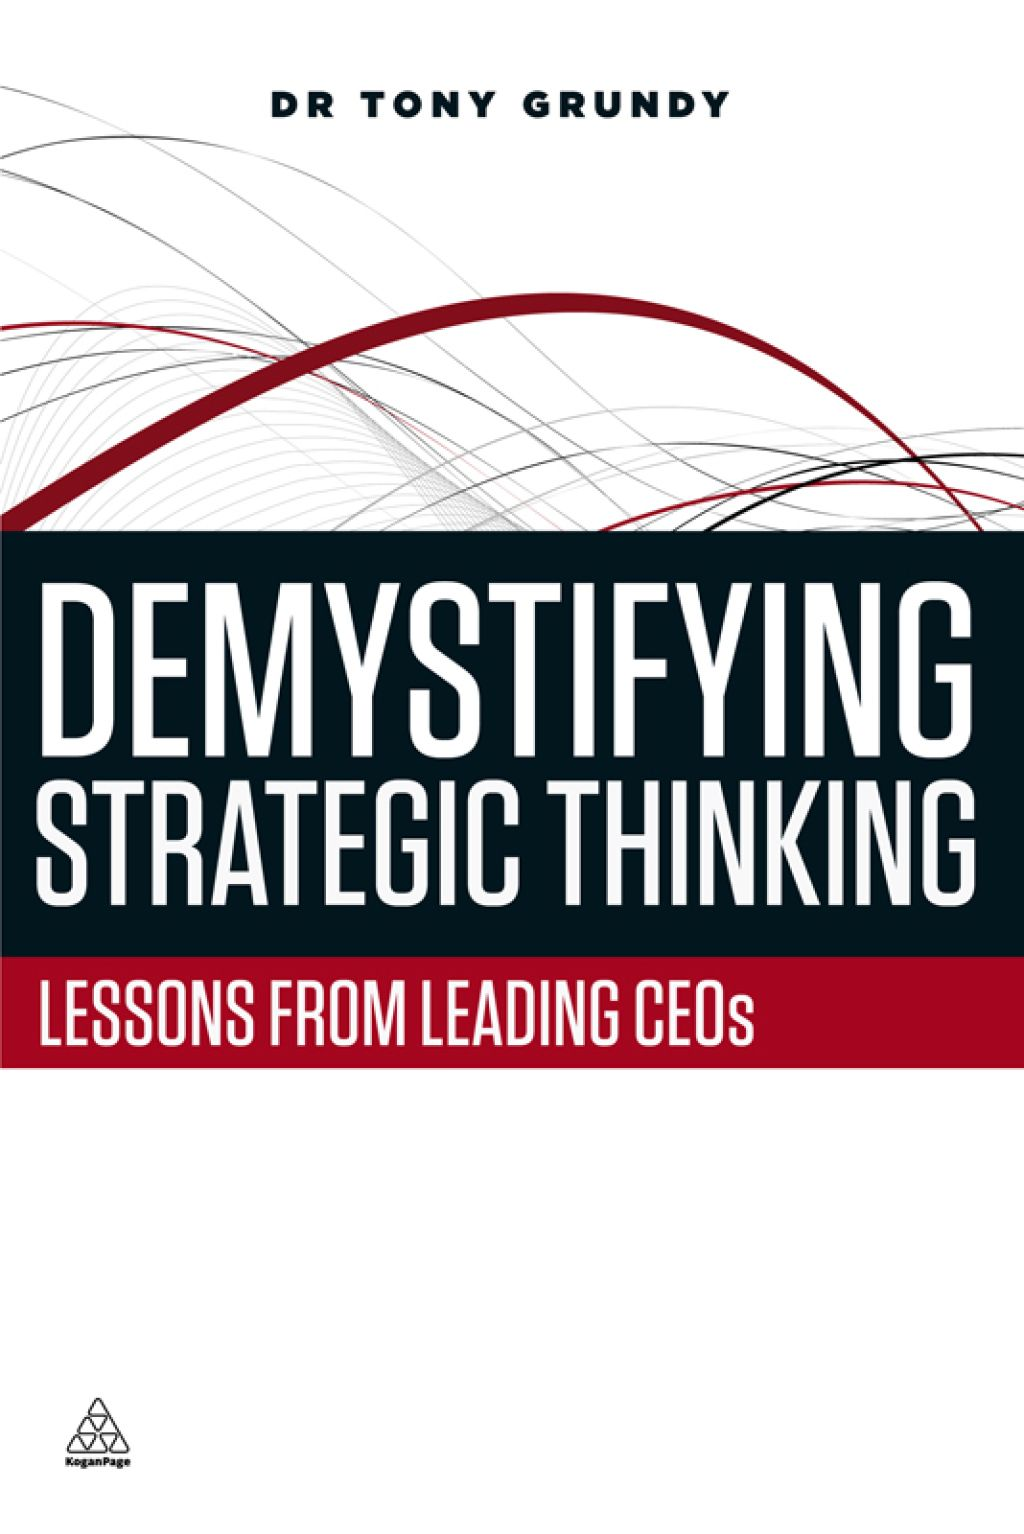 Demystifying Strategic Thinking (eBook)